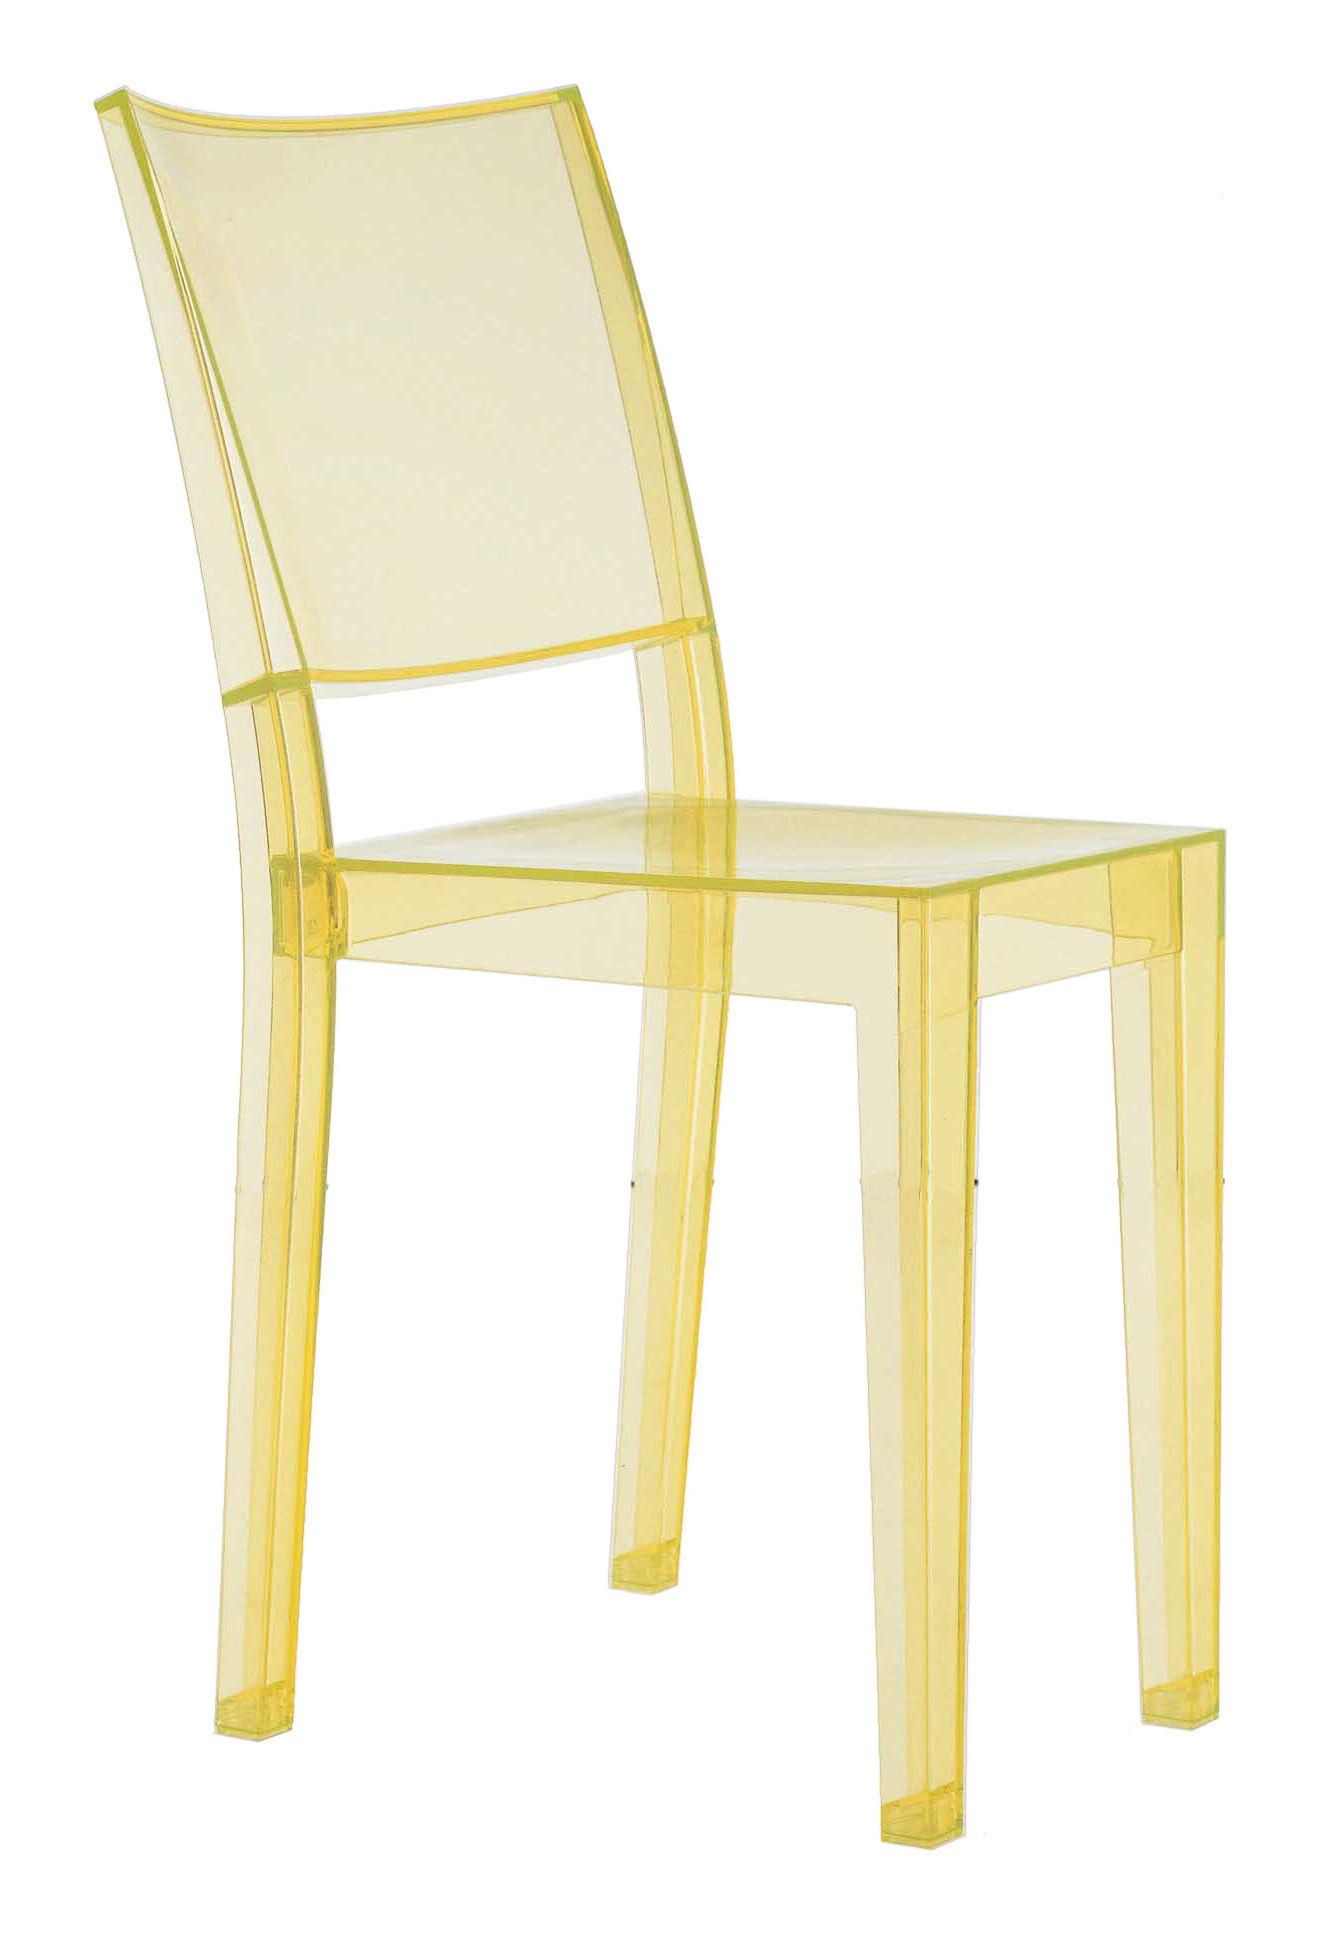 chaise empilable la marie polycarbonate jaune cidre kartell. Black Bedroom Furniture Sets. Home Design Ideas